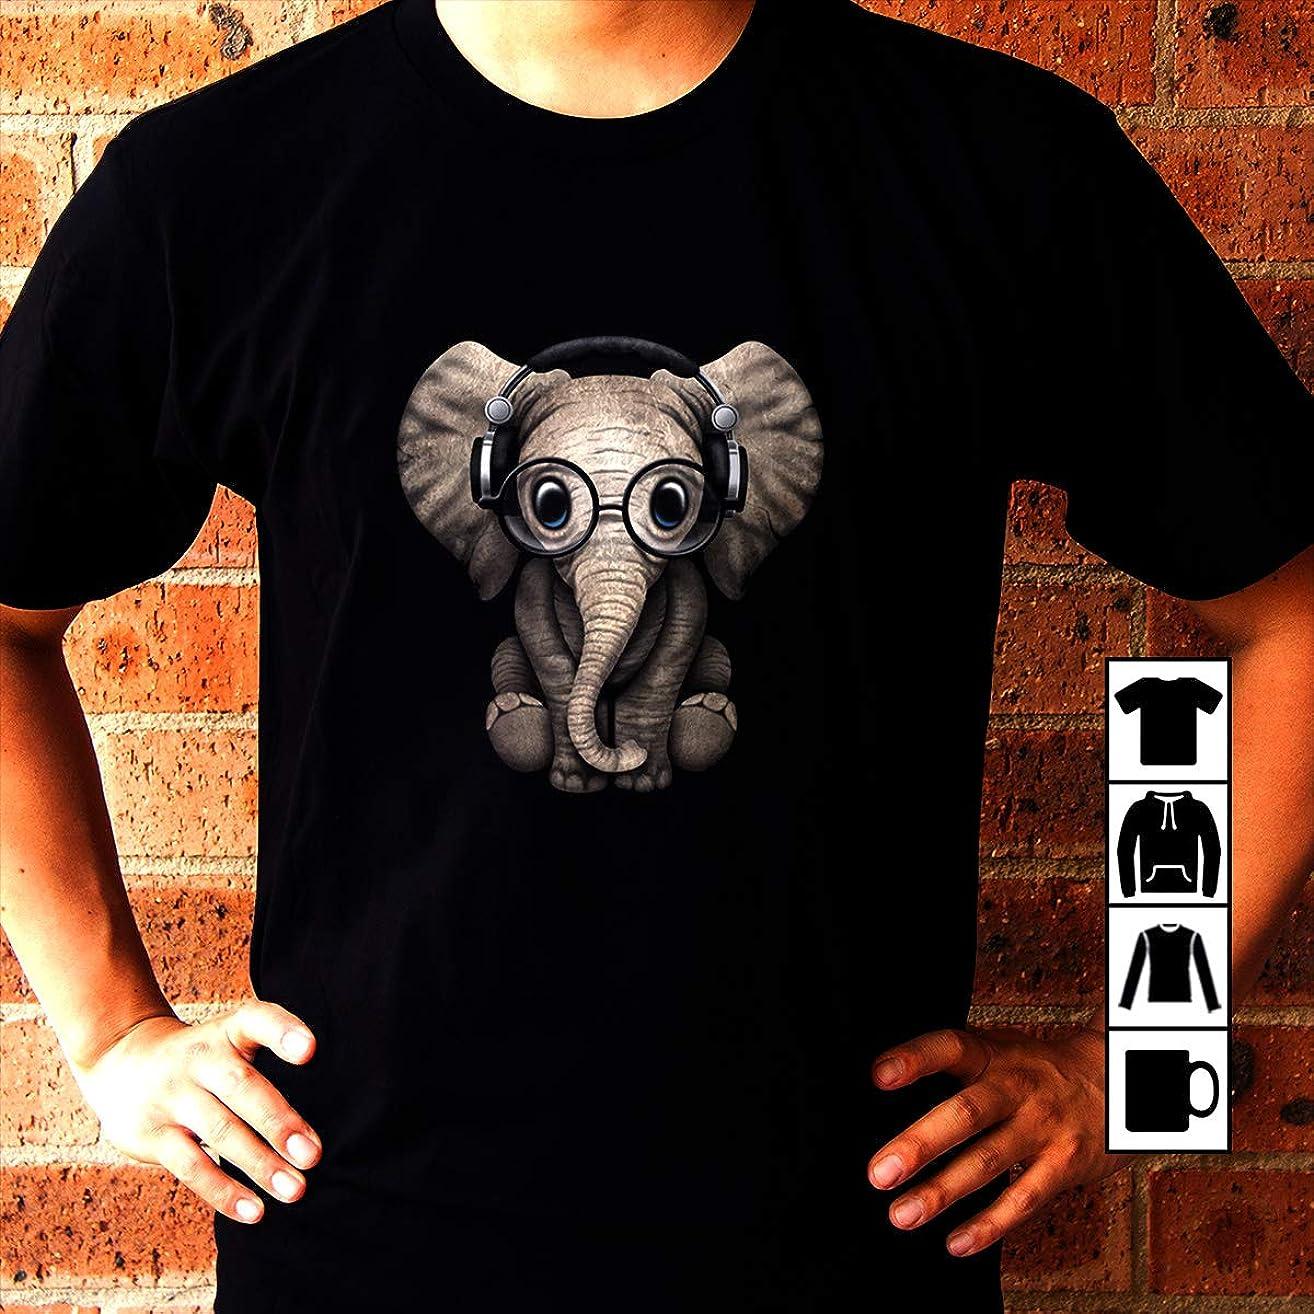 Elephant Cute Baby Elephant Dj Wearing Headphones and Glass T Shirt Long Sleeve Sweatshirt Hoodie Youth